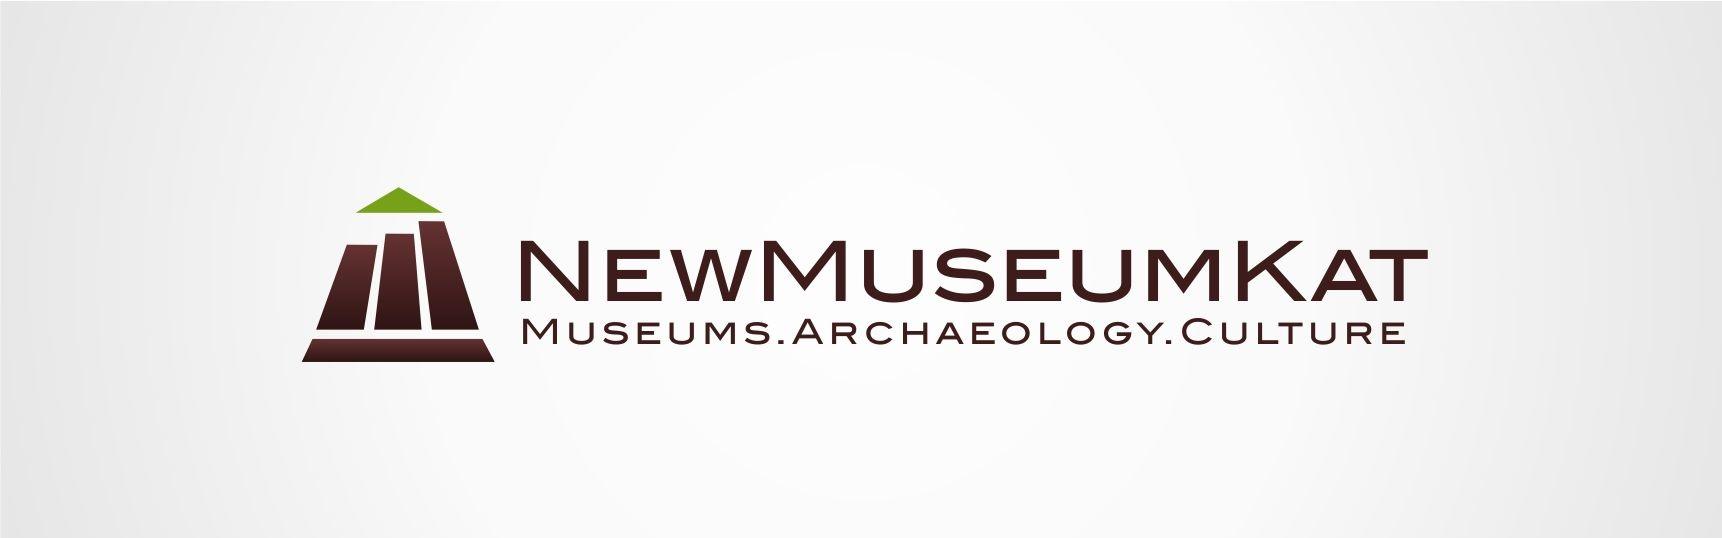 newmuseumkat